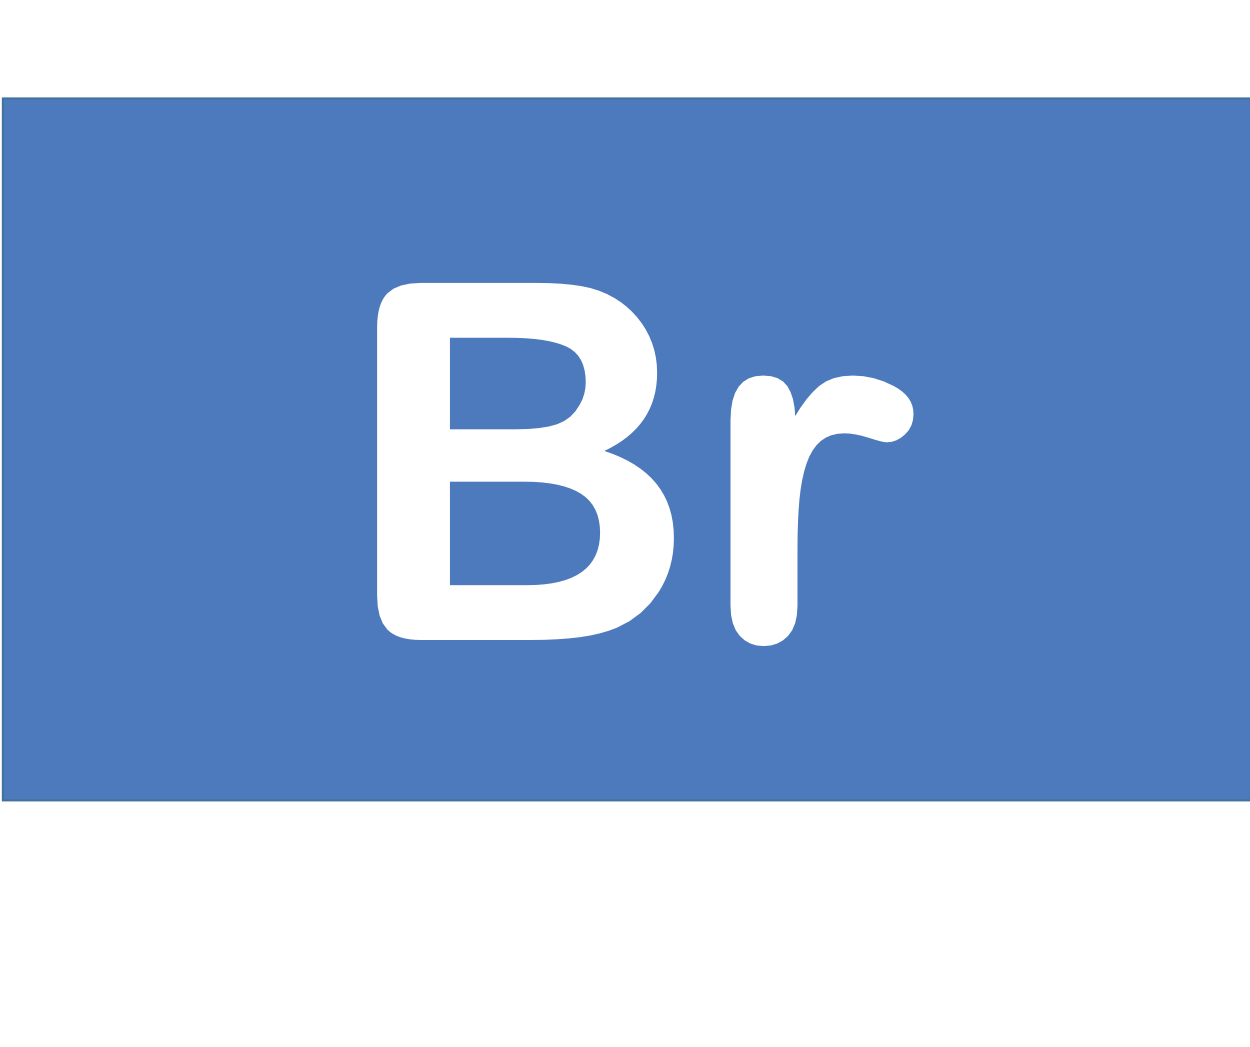 35 Br 臭素 Bromine 元素 記号 周期表 化学 原子